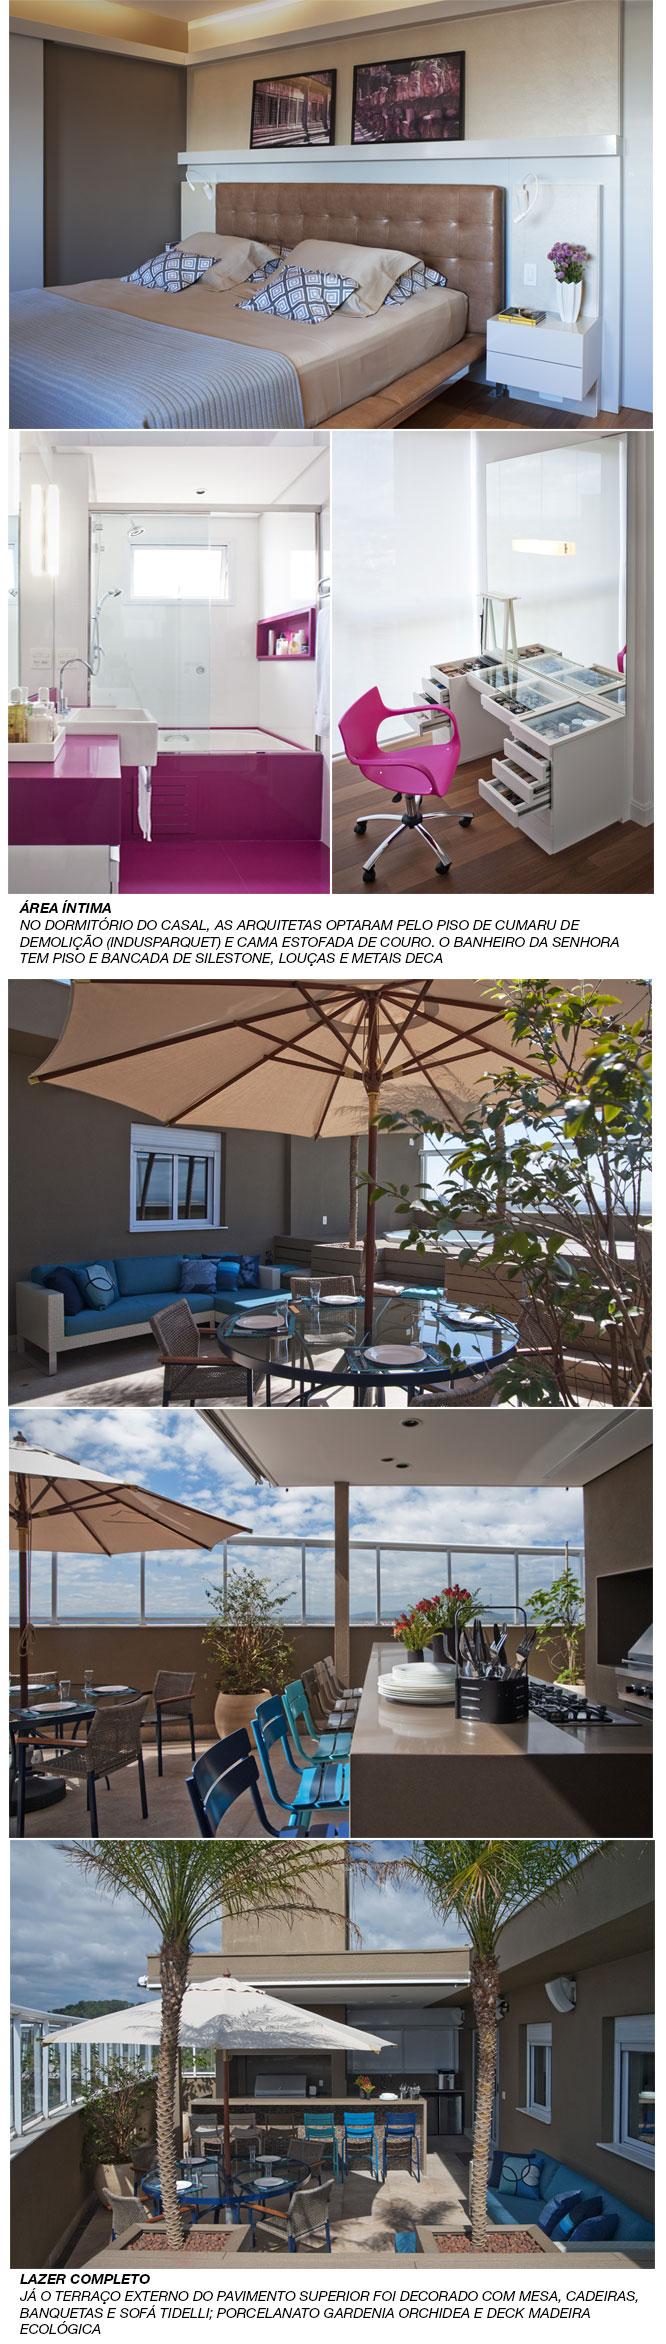 kta-arquitetura2